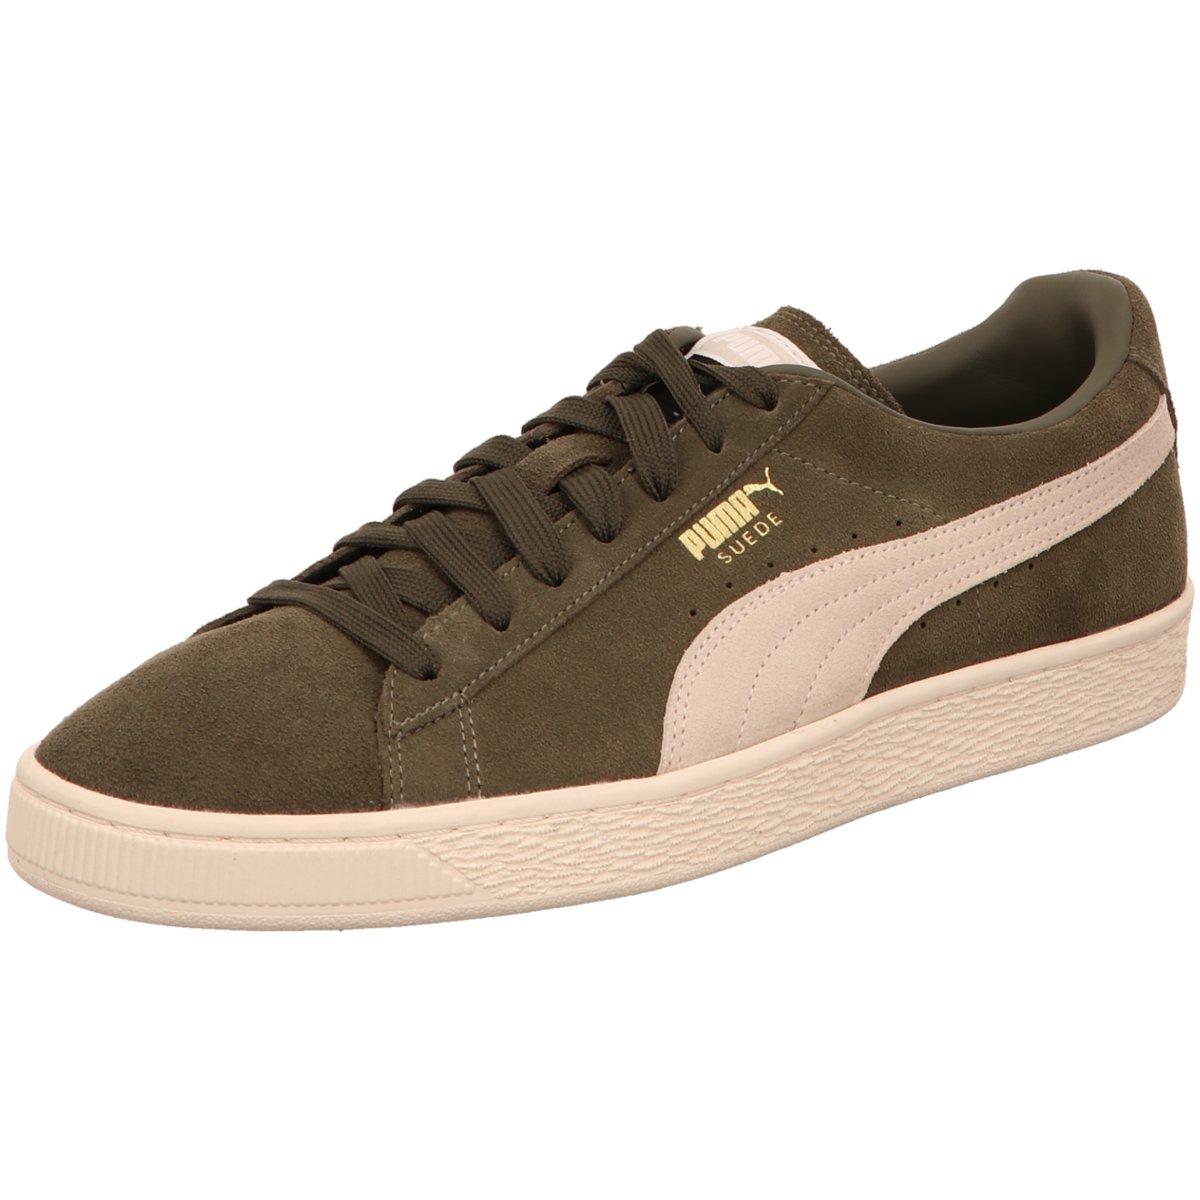 Details zu #S2K Puma Herren Sneaker Suede Classic Sneaker Herren Schuhe olive 363242 027